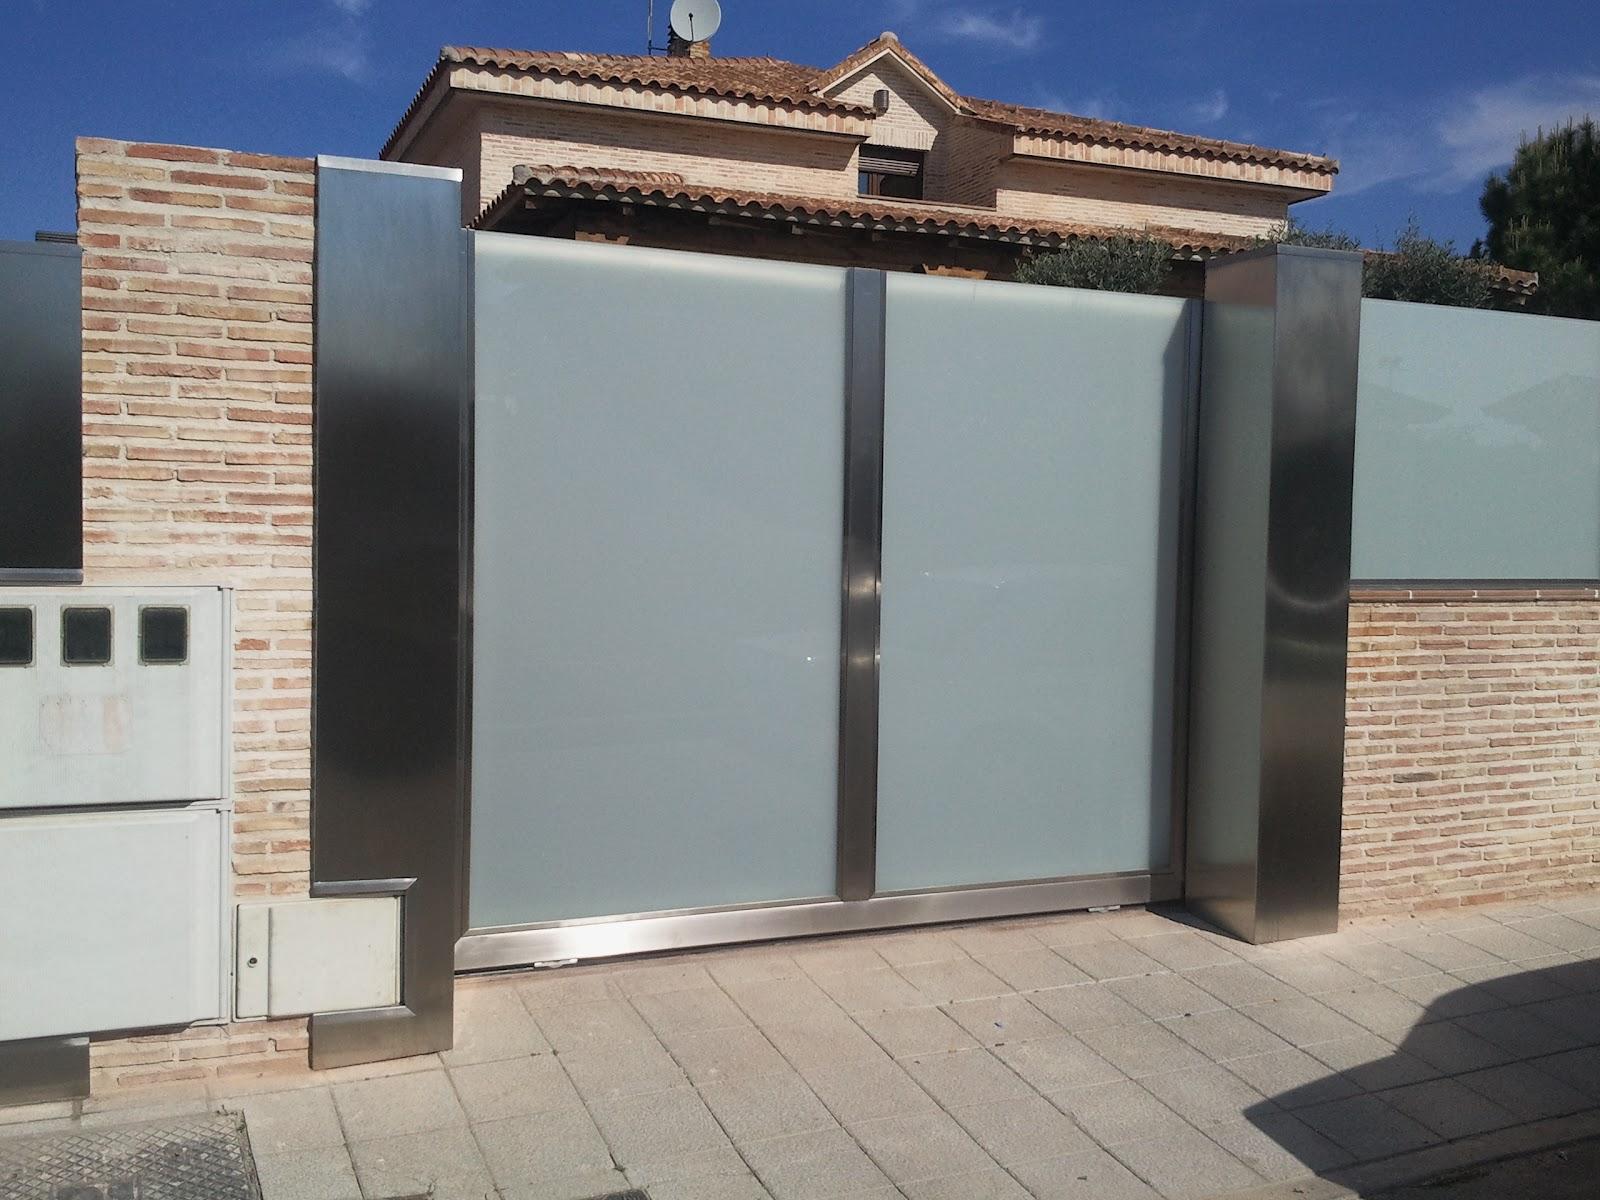 Puertas entrada chalet materiales de construcci n para for Puertas chalet exterior